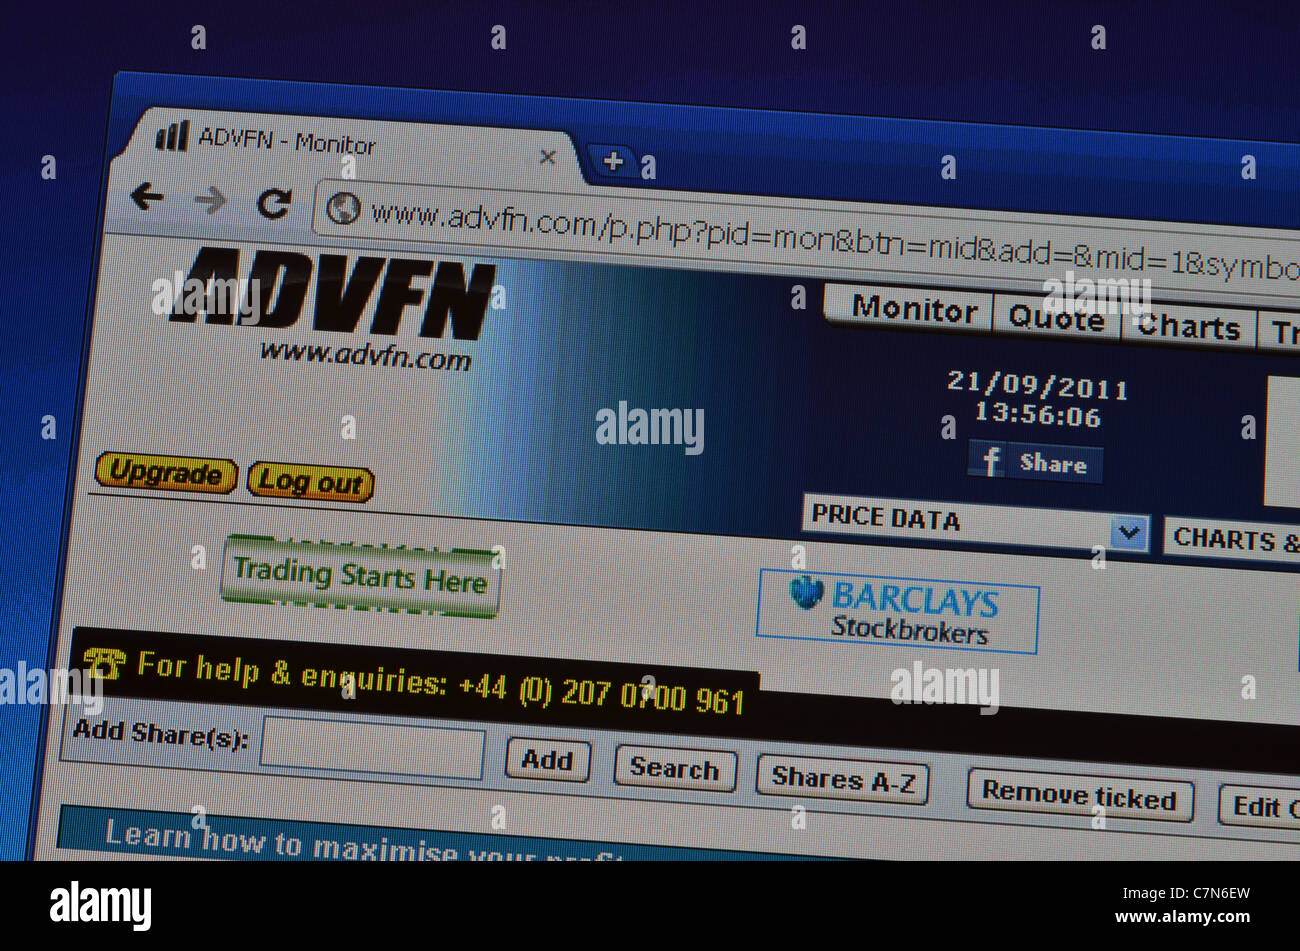 ADVFN website homepage screenshot - Stock Image